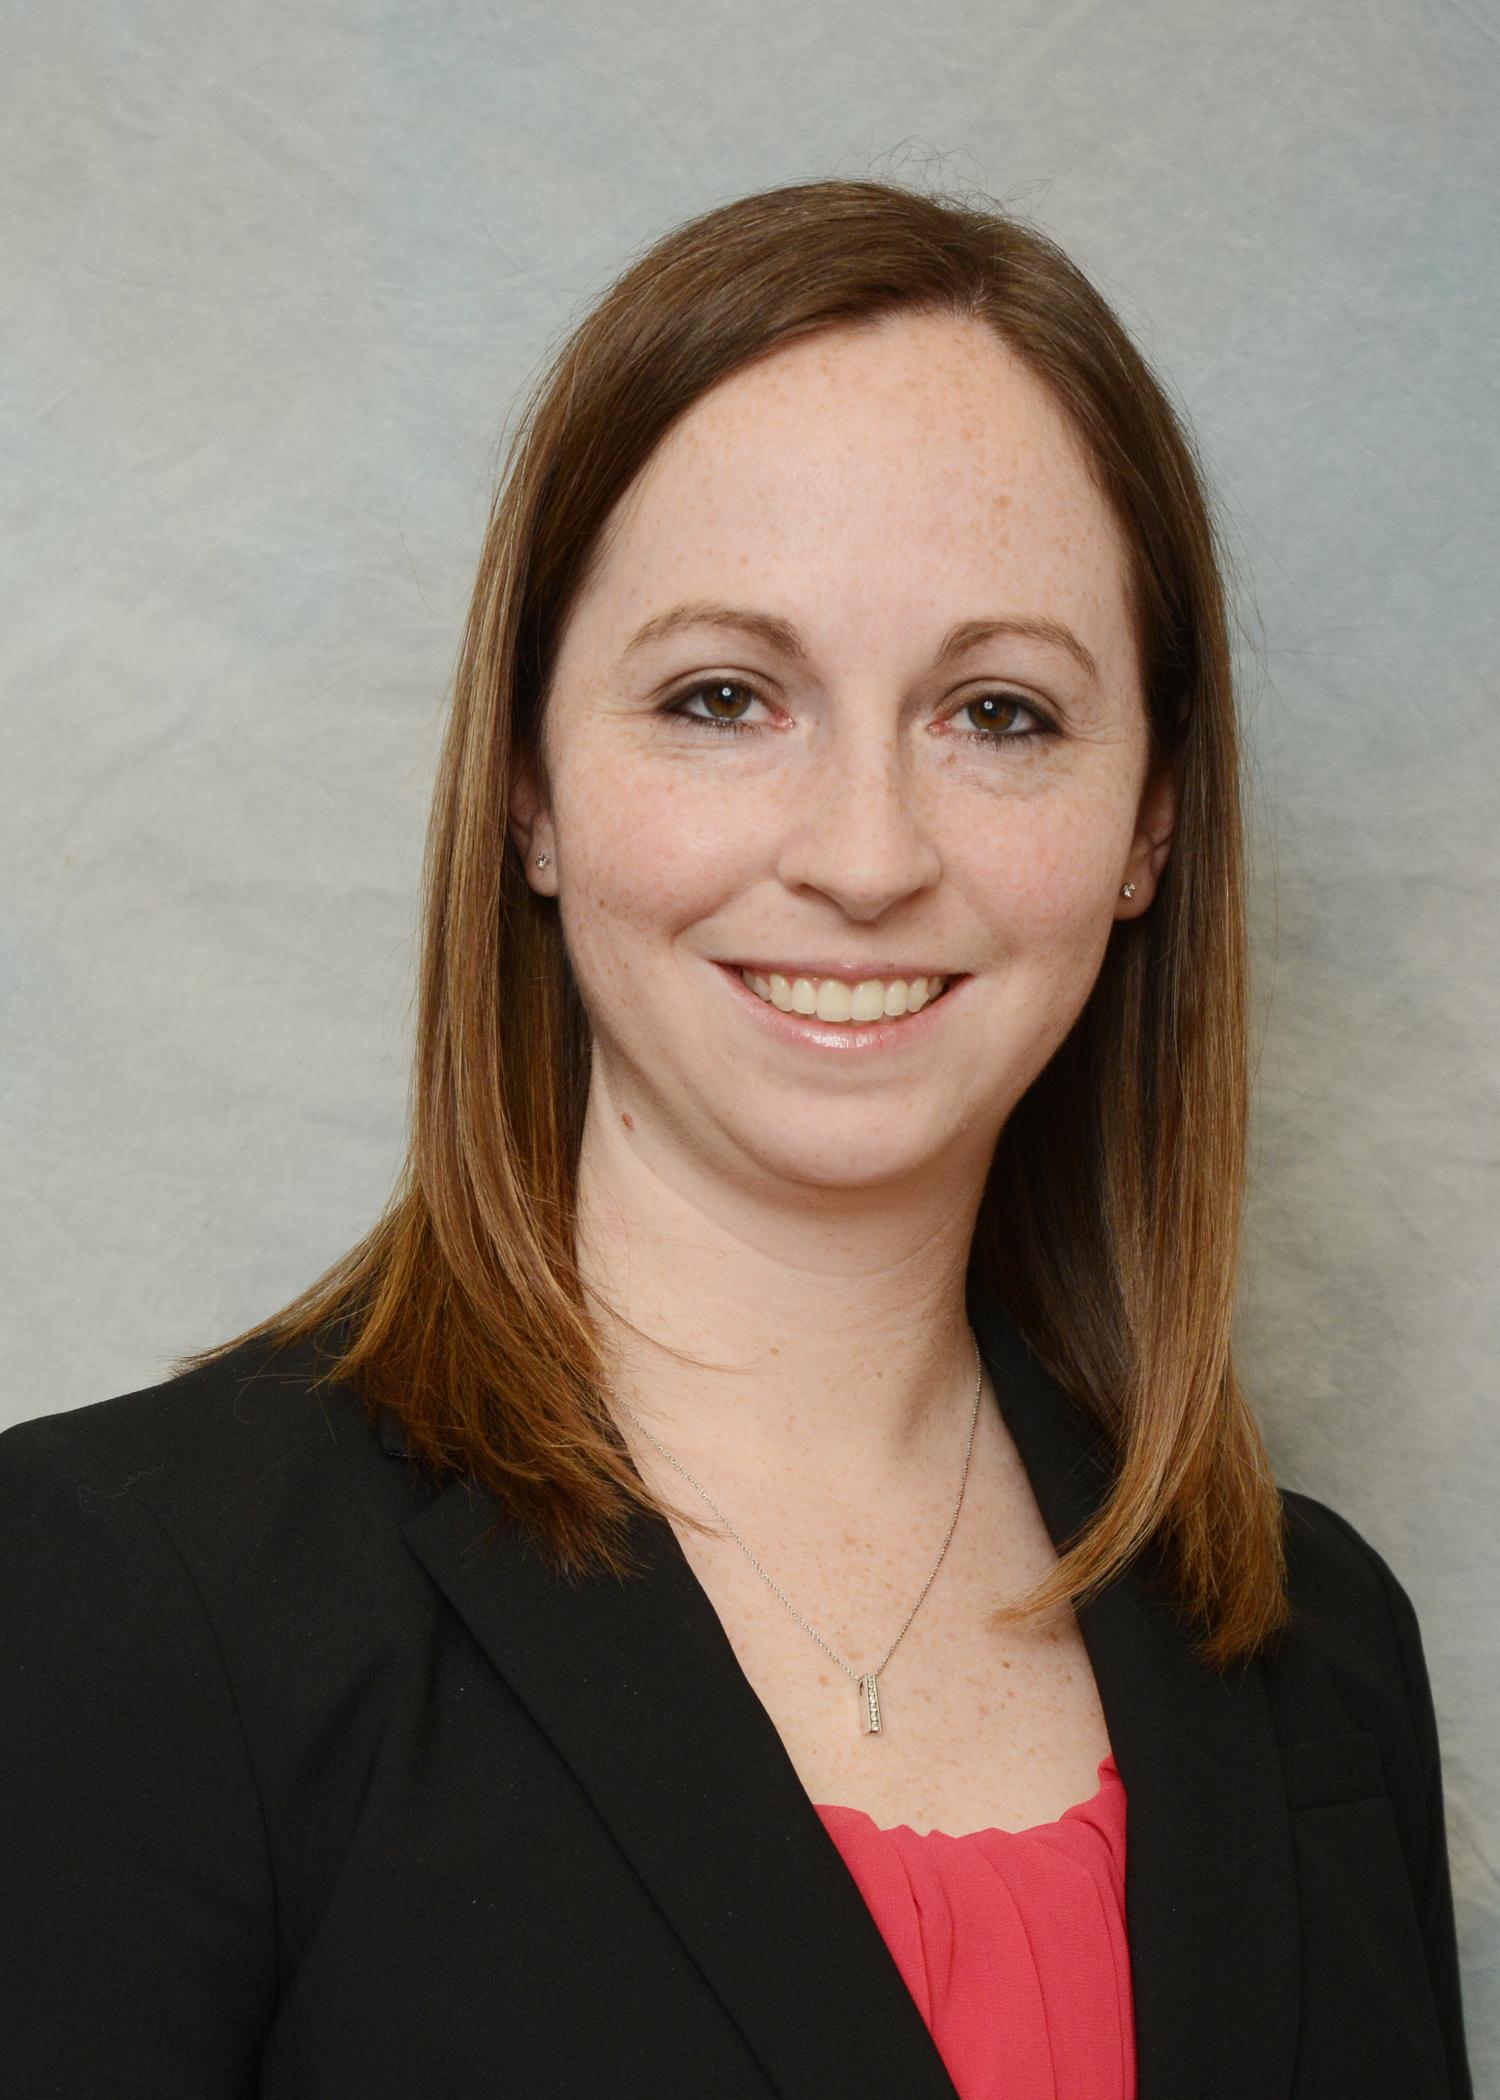 Dr. Teri Shepherd